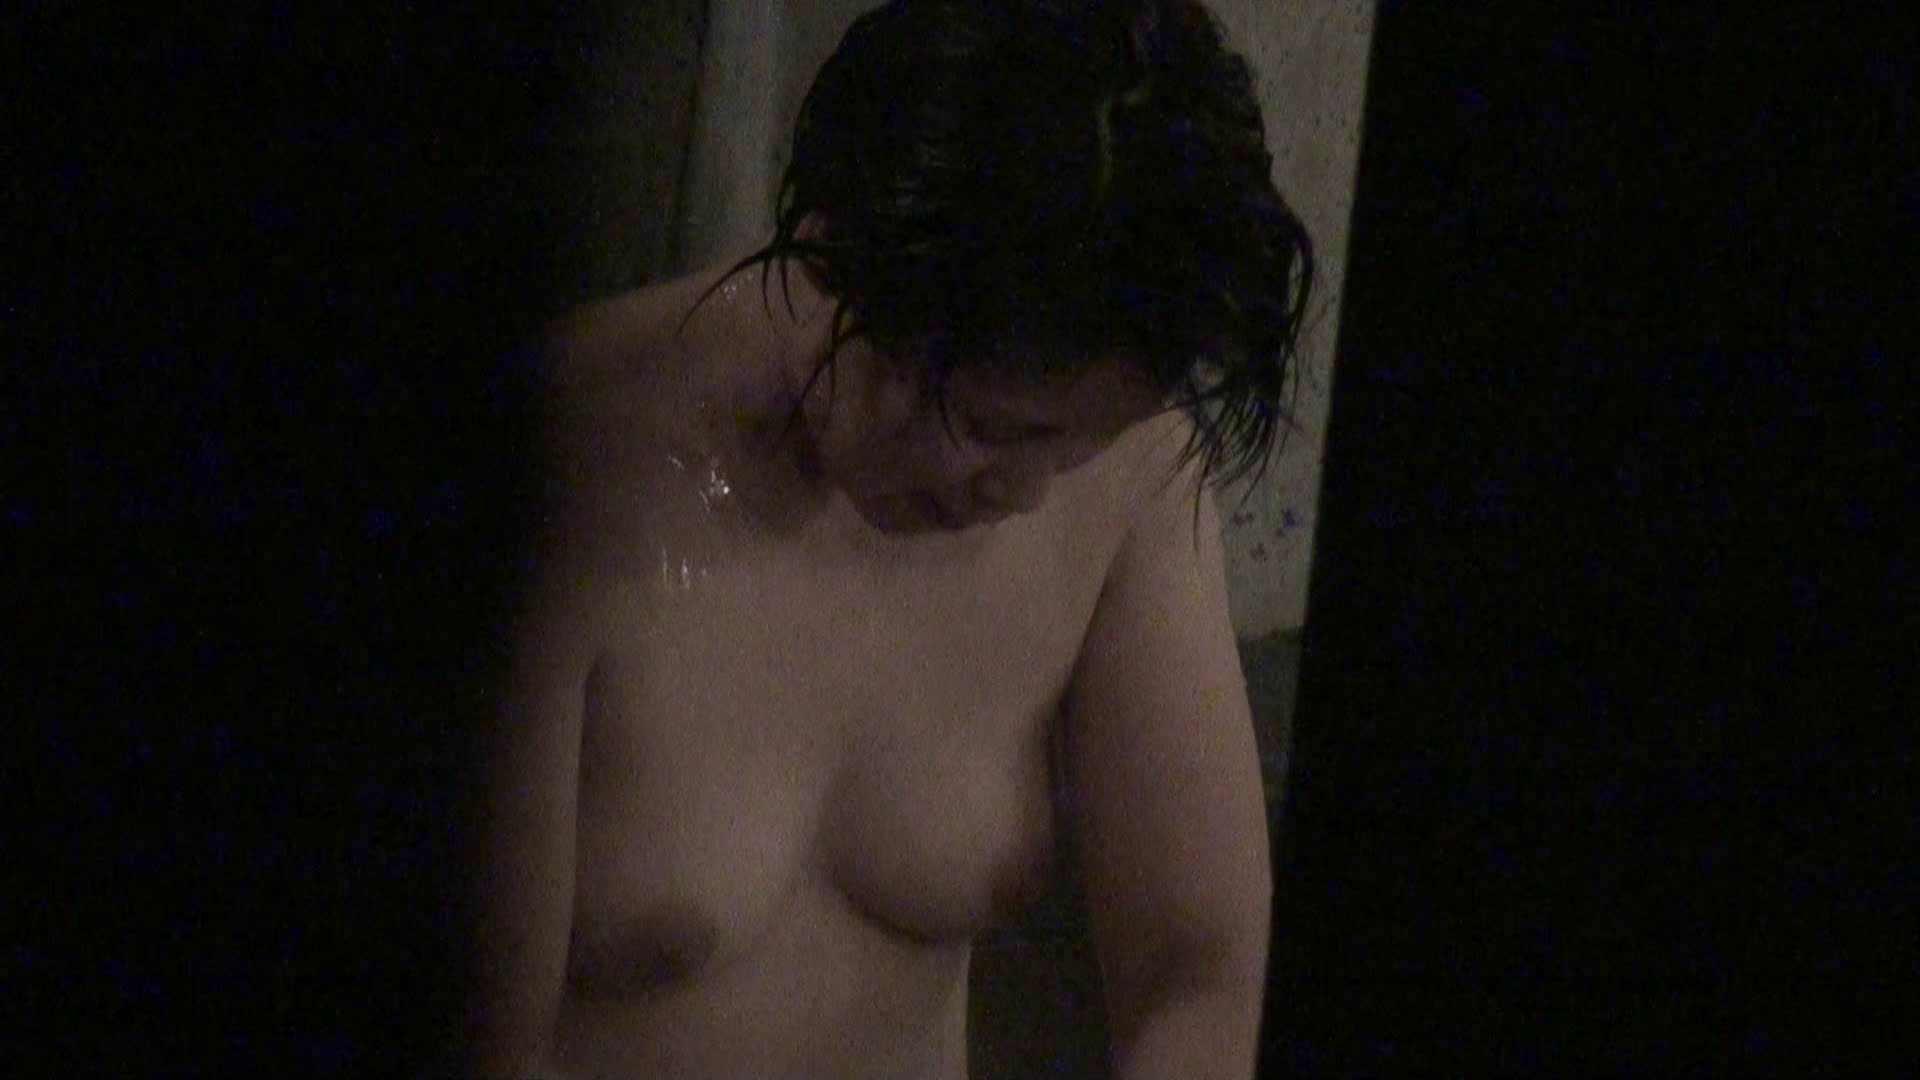 Aquaな露天風呂Vol.389 OLセックス  84画像 30